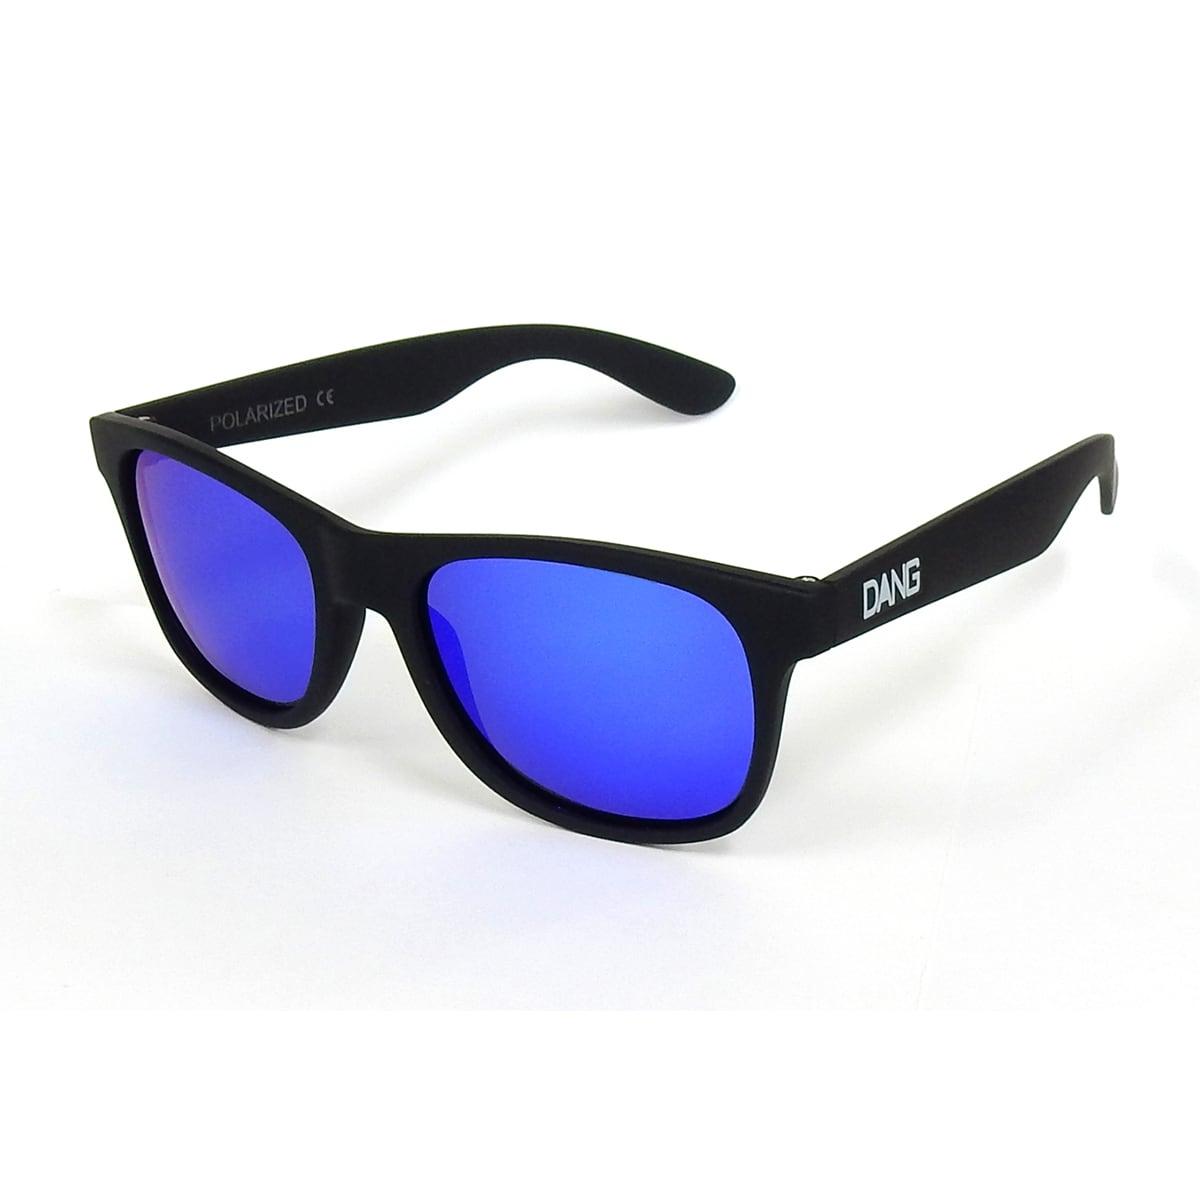 DANG SHADES  Black Soft x Blue Mirror Polarized・vidg00240(偏光レンズ)